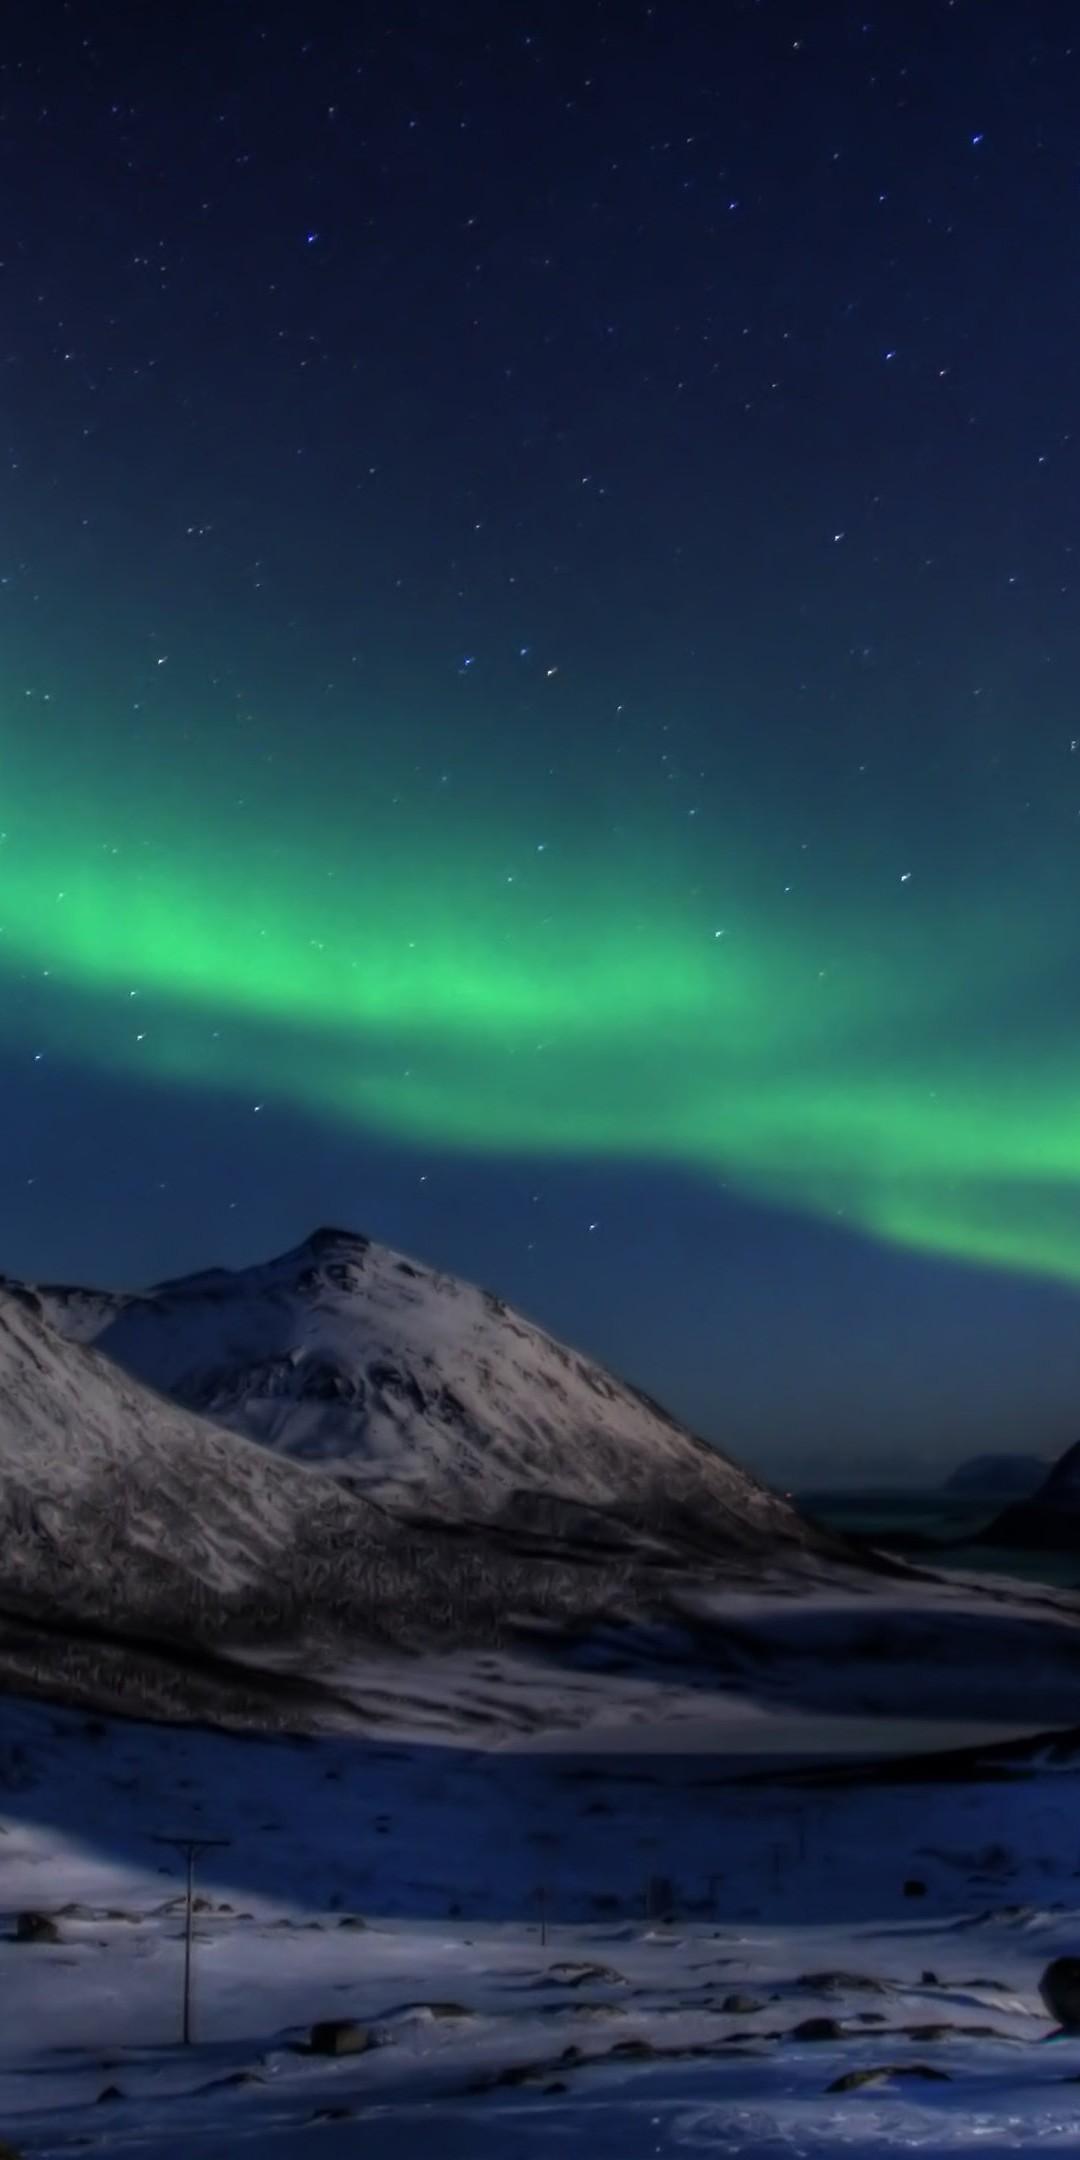 Aurora Borealis Wallpaper Free HD